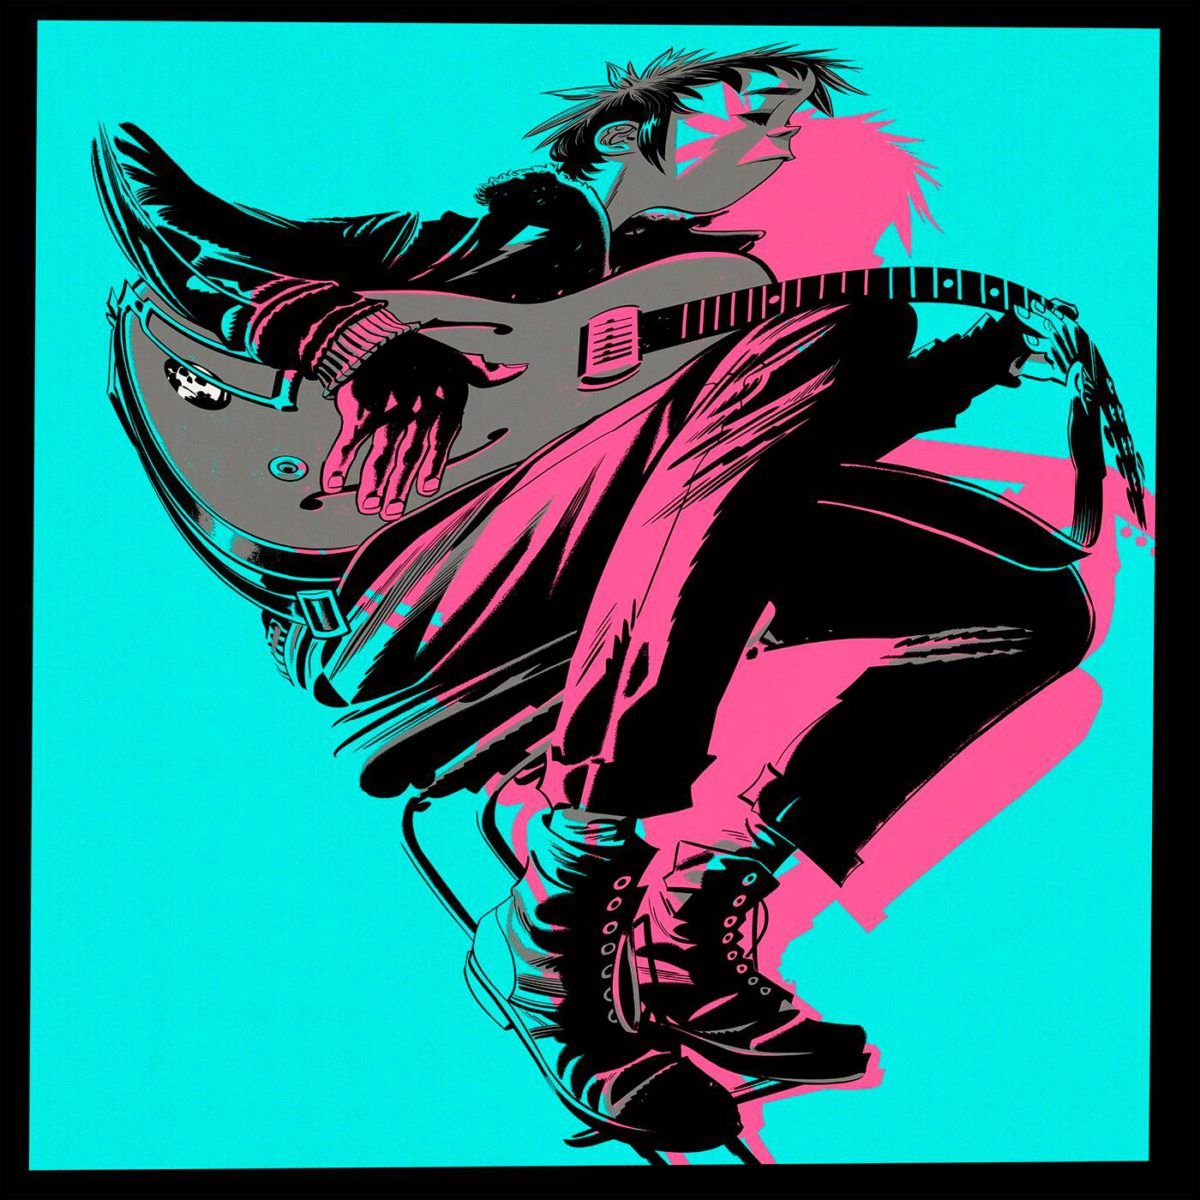 Gorillaz: The Now Now. Parlophone, 2018.